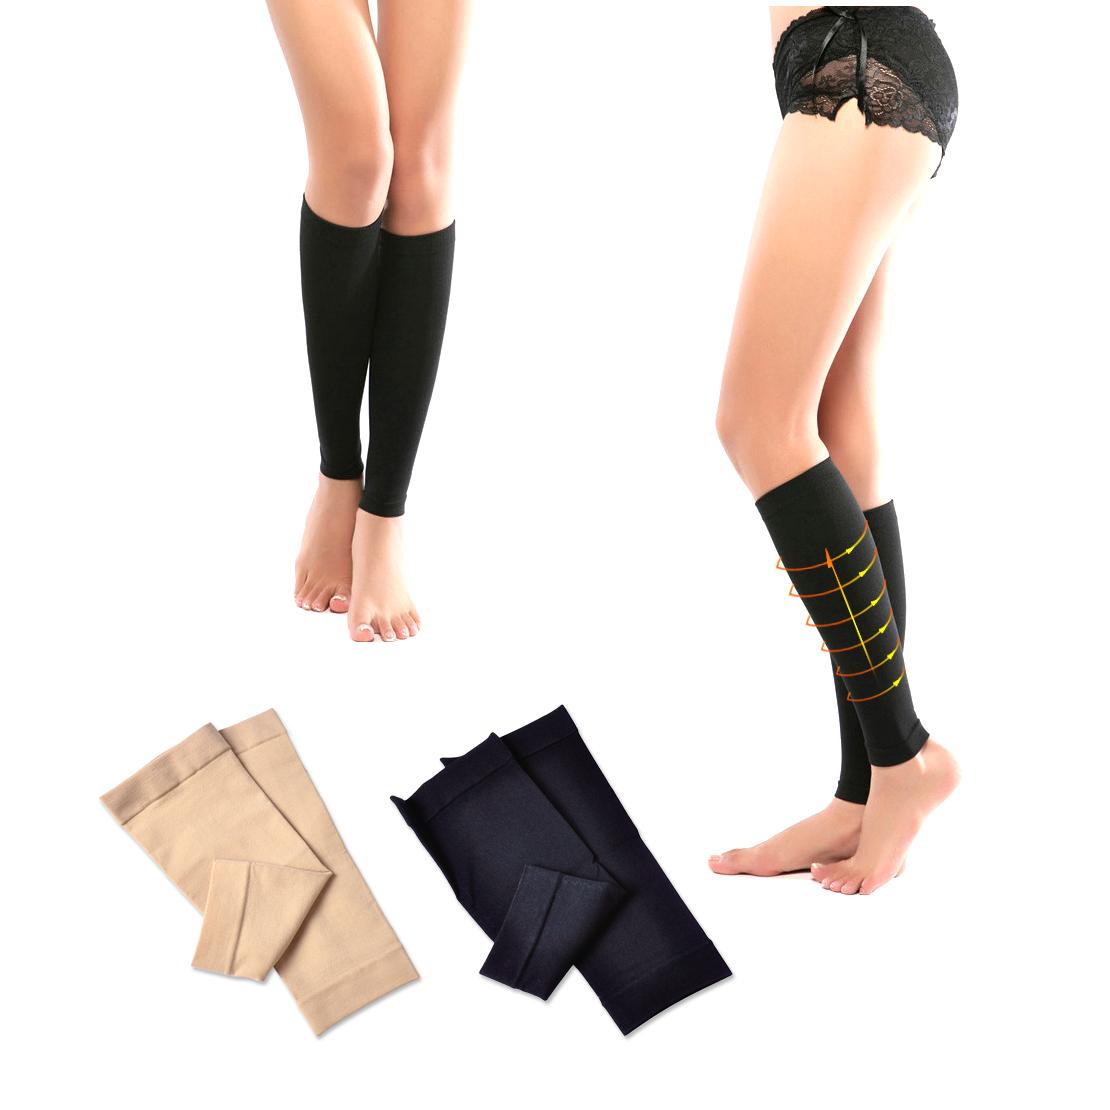 Kalb Kompression Hülse Bein Socke Shin Splint Guard für Sport Basketball NEU